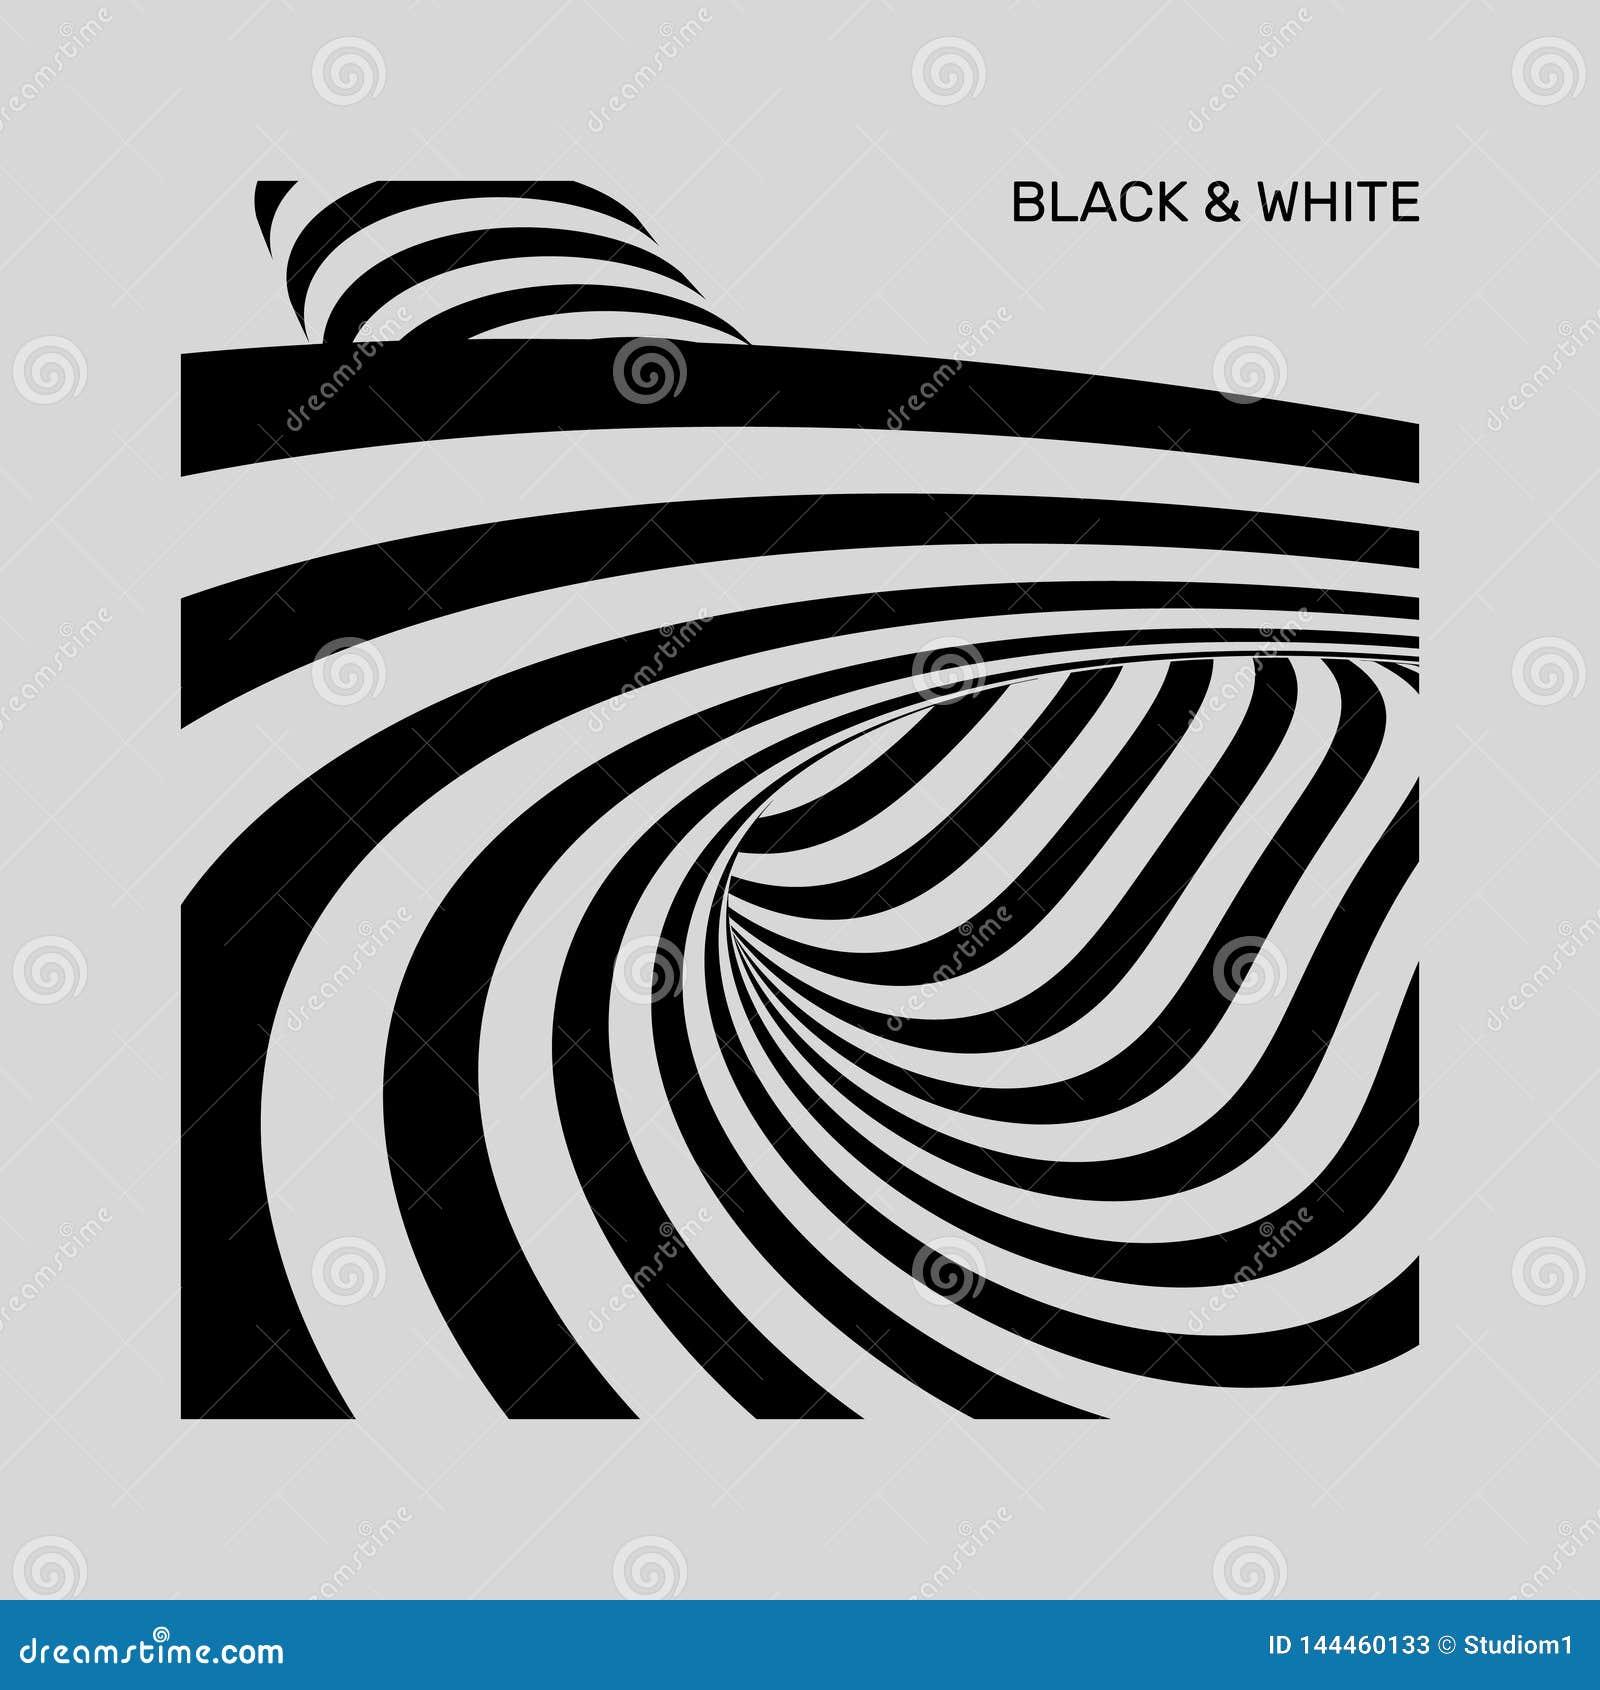 Tunnel Optische illusie Zwart-witte abstracte gestreepte achtergrond 3d vectorillustratie